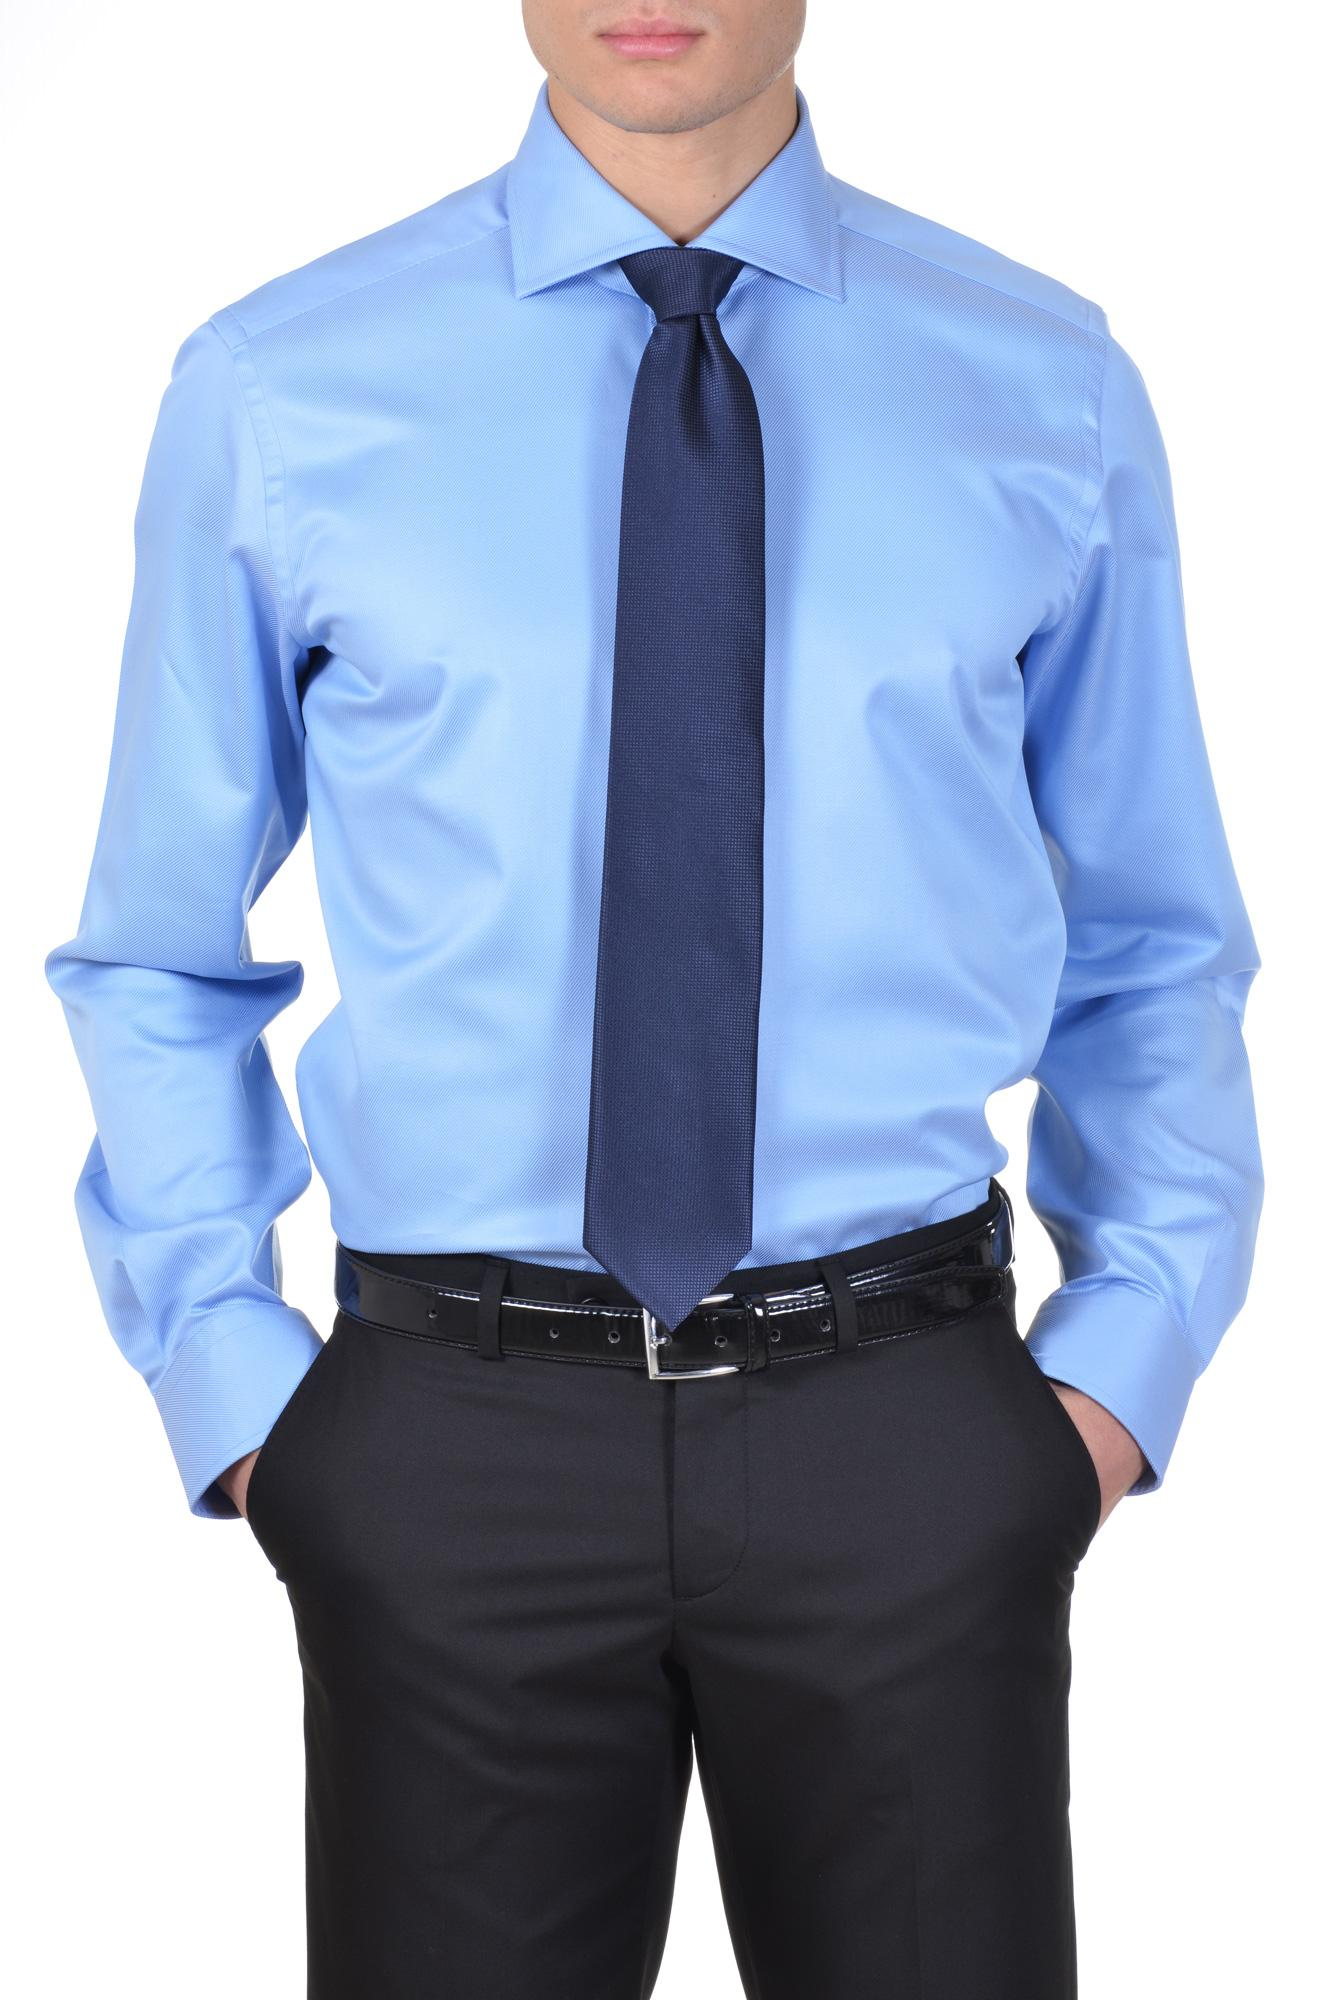 chemise bleu ciel je la pr f re la blanche. Black Bedroom Furniture Sets. Home Design Ideas